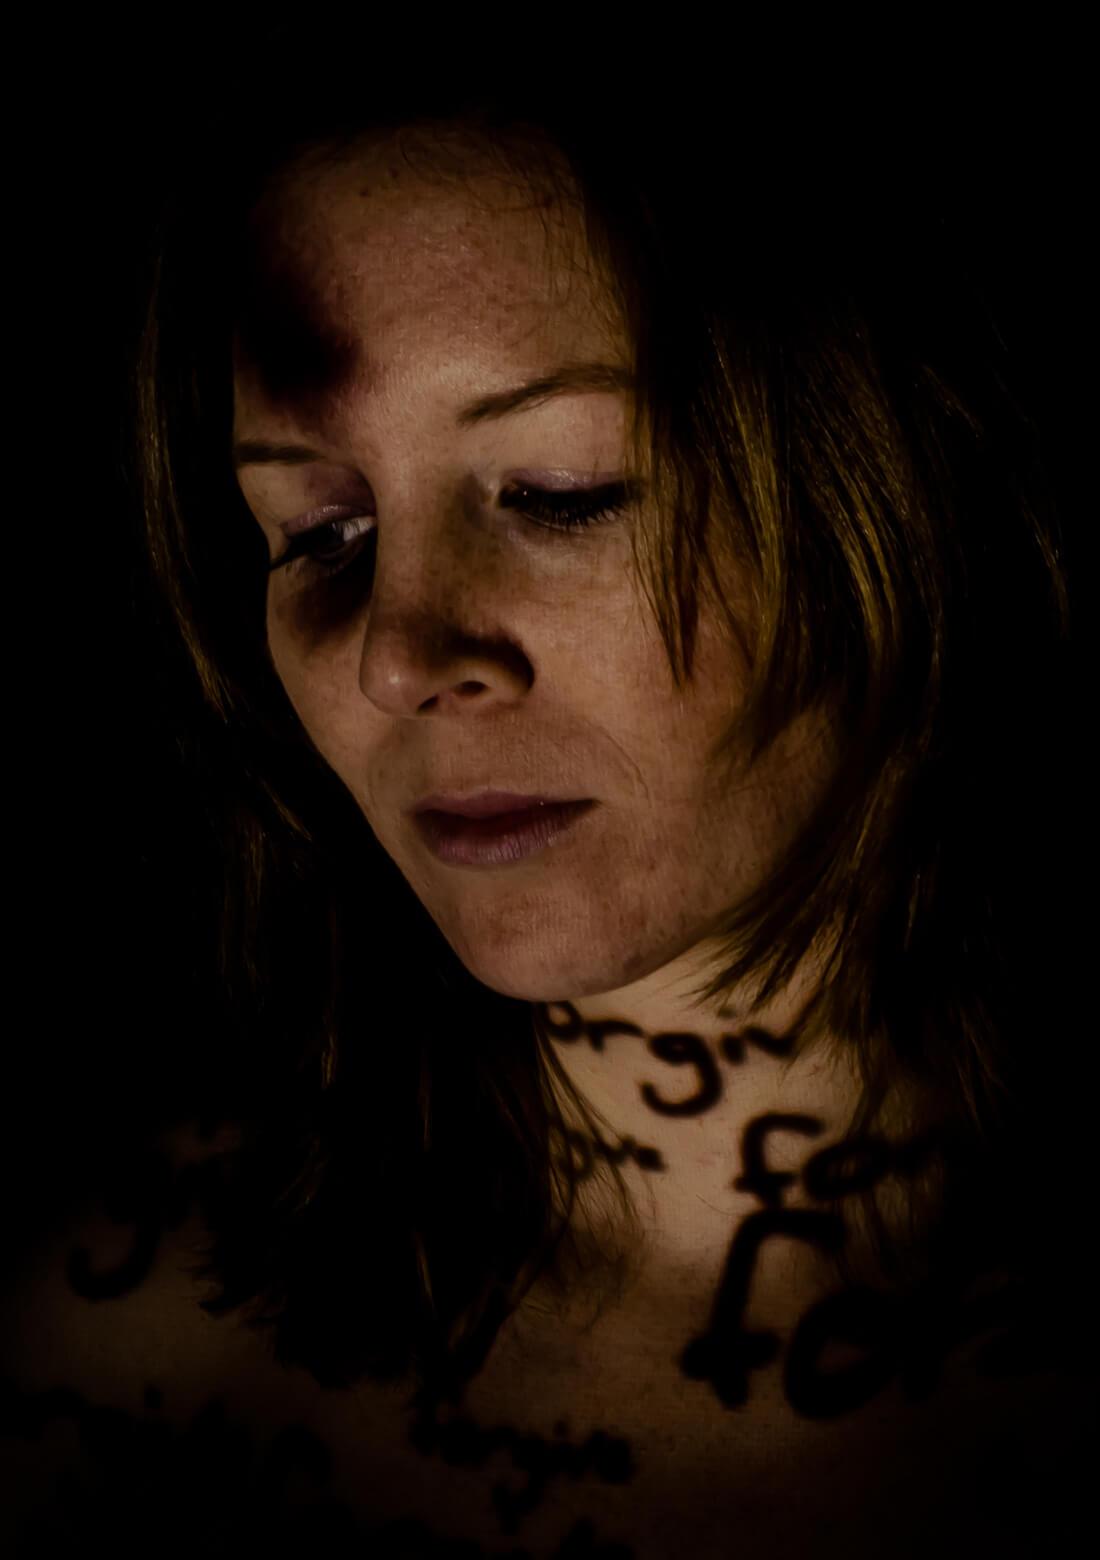 Fotoreportage battered women